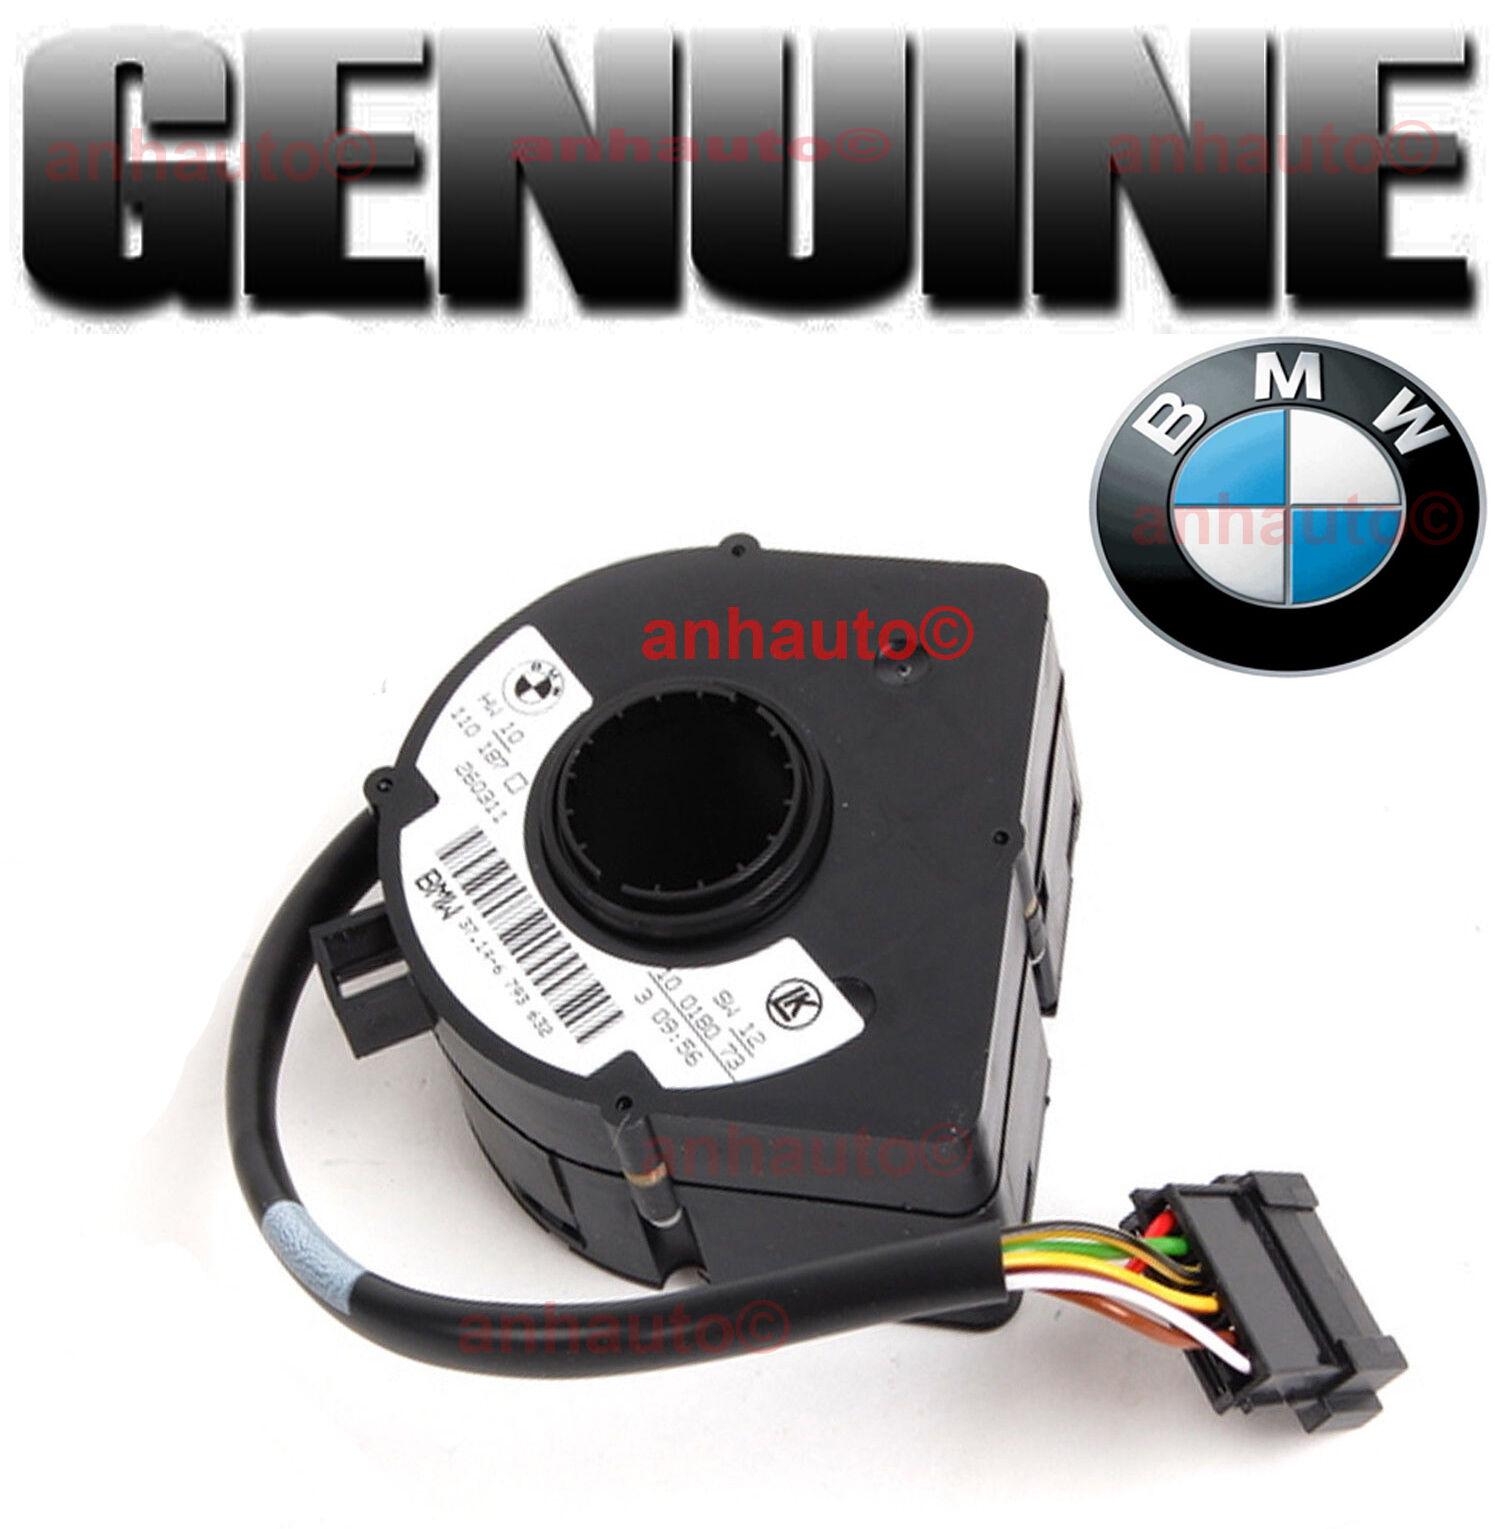 Bmw Z8 Steering Wheel: OEM Stability Control Steering Angle Sensor BMW E38 E39